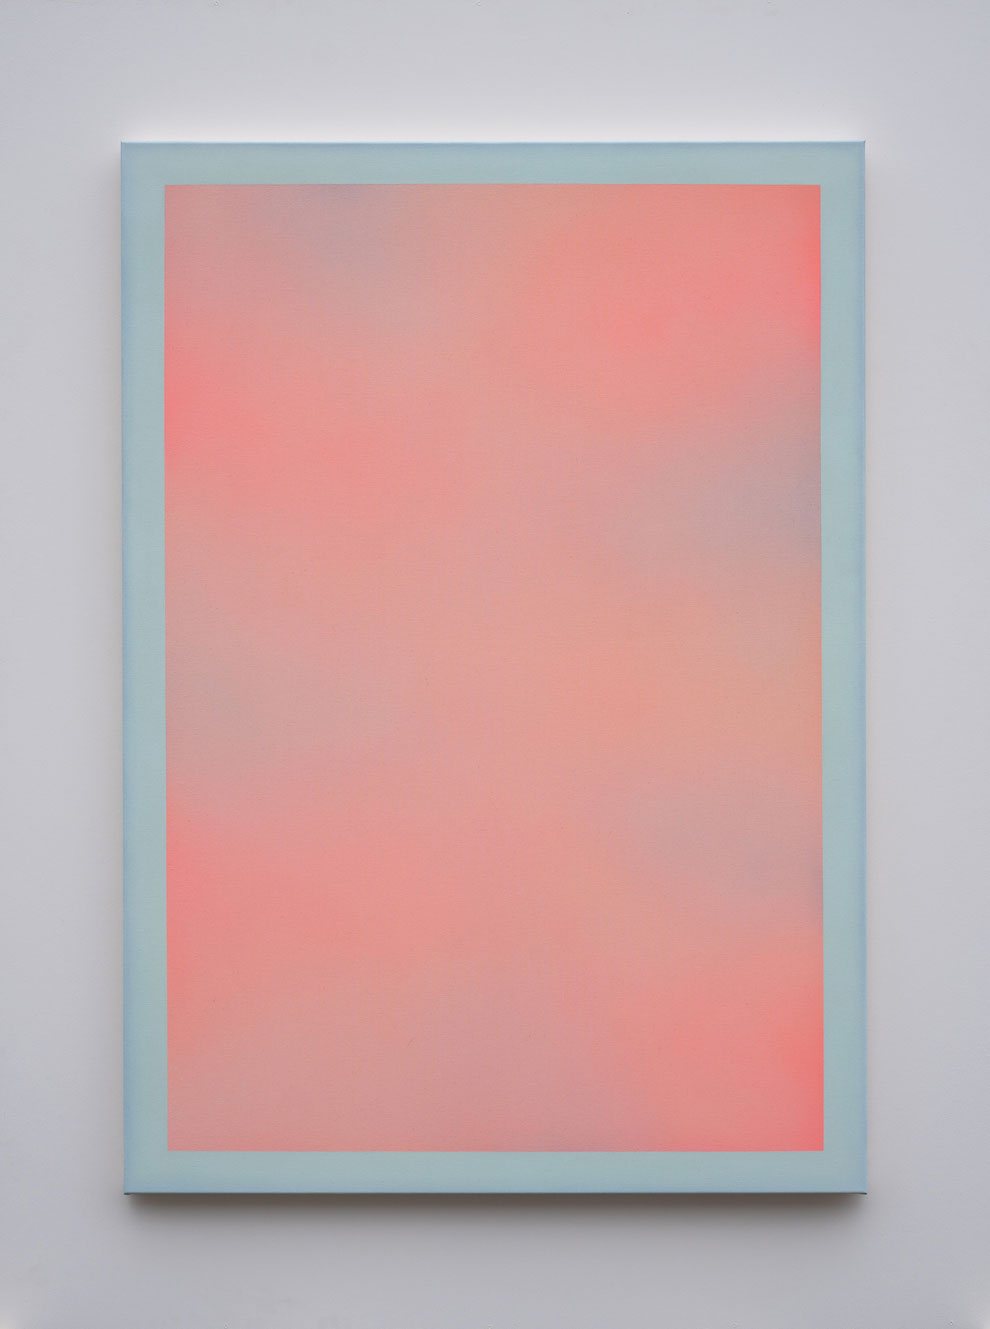 "Alina Birkner ""Untitled (Pink and Blue)"" 2021, 170x120 cm"